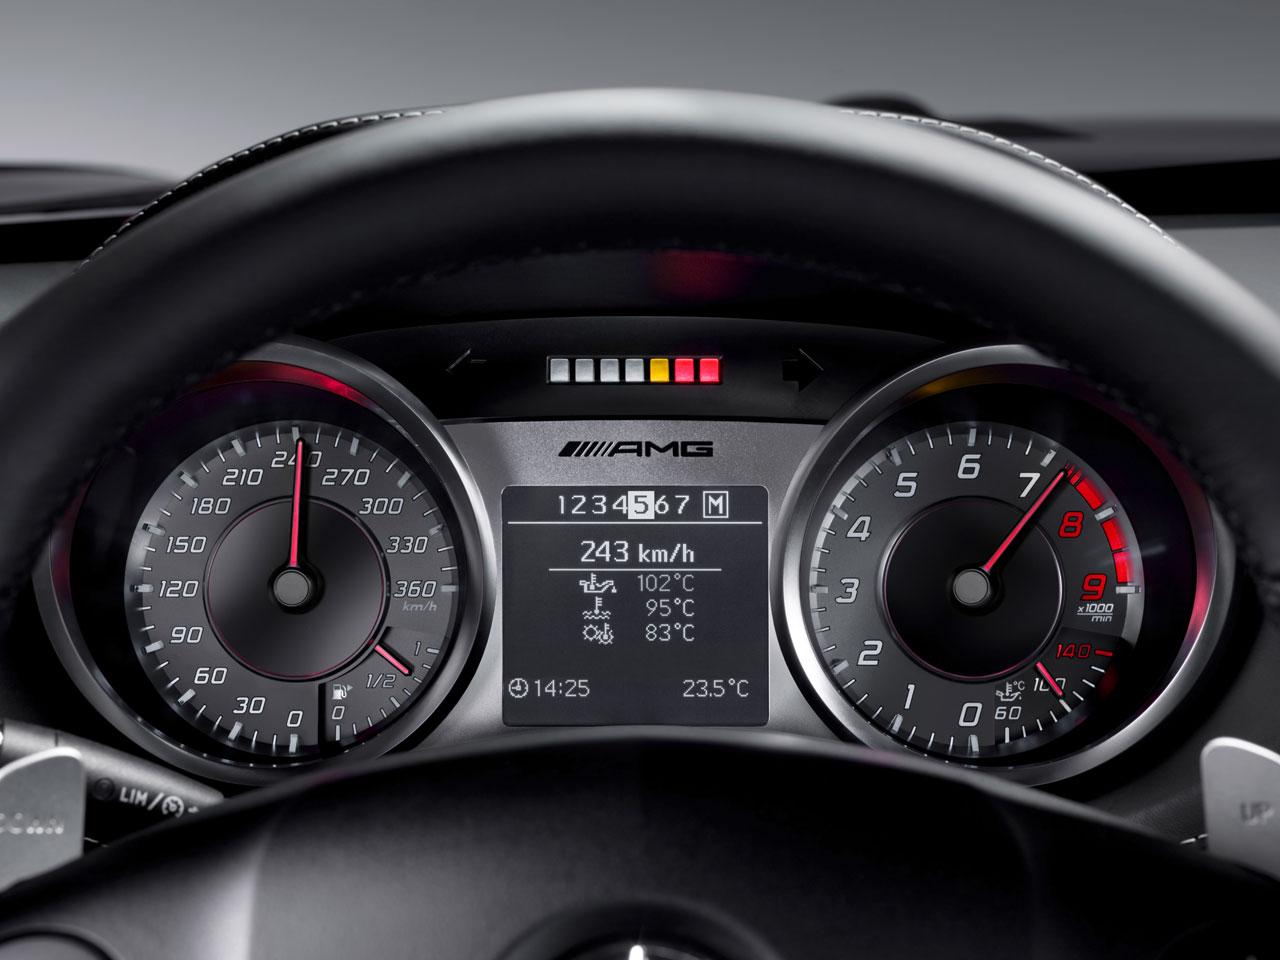 http://1.bp.blogspot.com/-2V46t7Aorak/TiW95ILWGuI/AAAAAAAAAak/CCfE22IkqFI/s1600/Mercedes-Benz-SLS-AMG-Interior-review.jpg